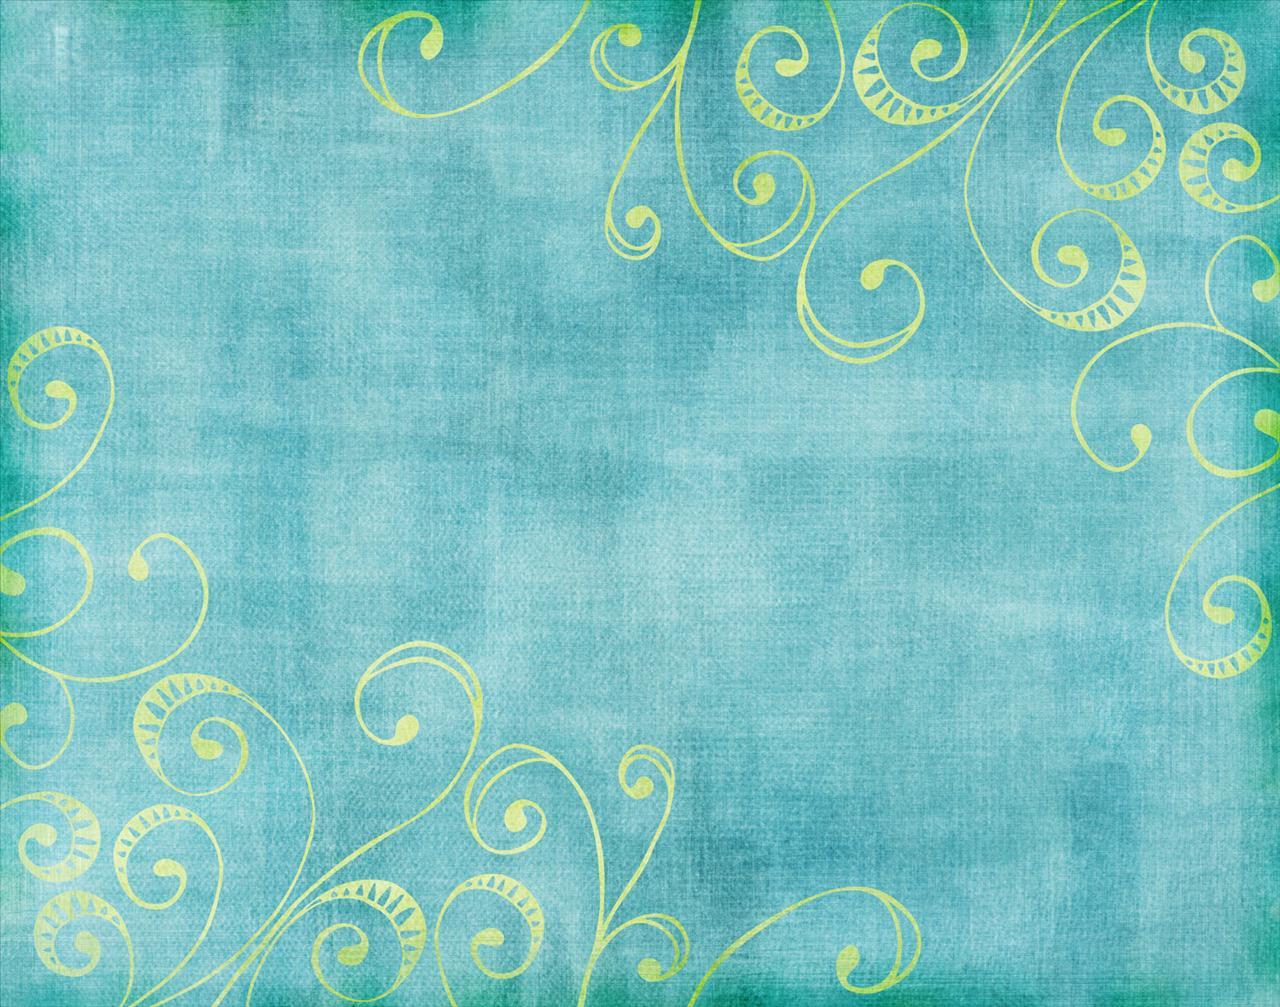 Turquoise and gold wallpaper wallpapersafari - Turquoise wallpaper pinterest ...